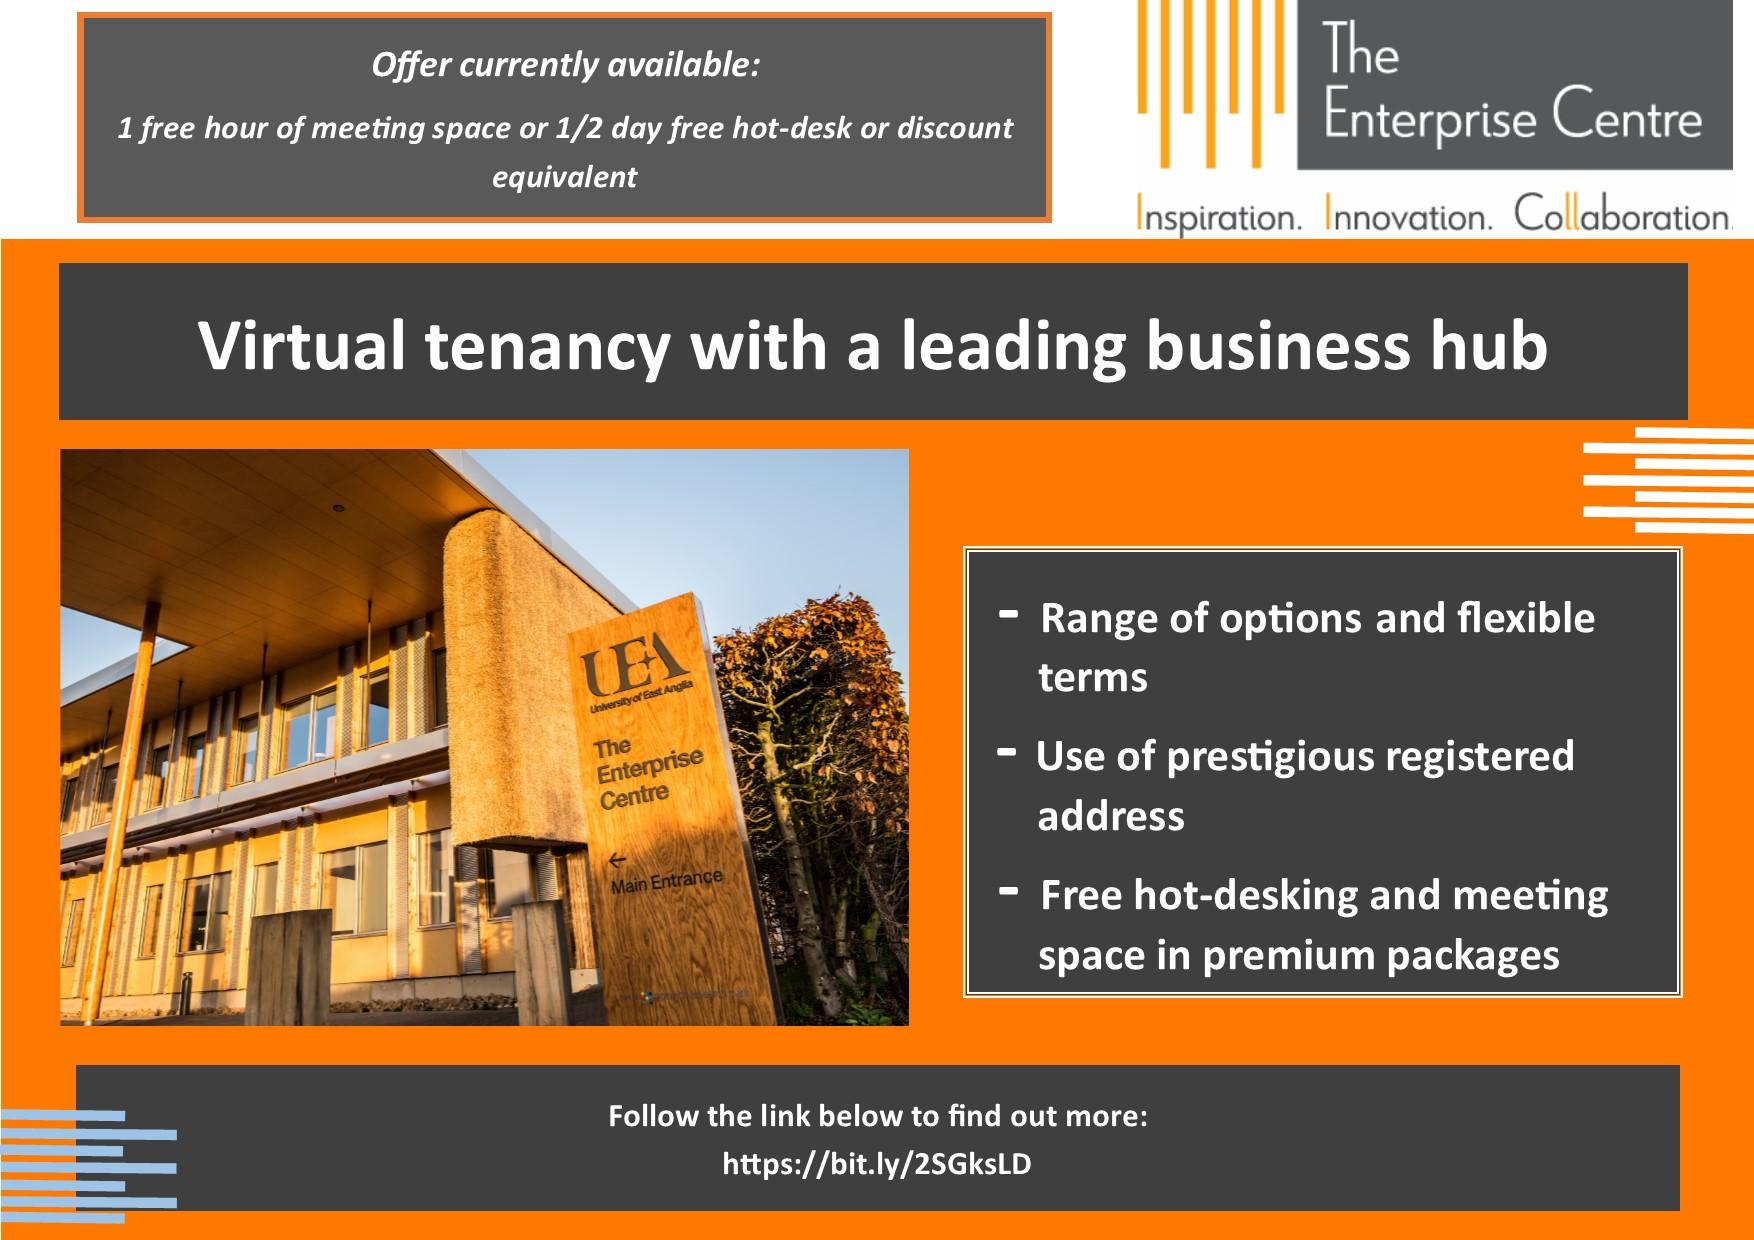 The Enterprise Centre Norwich Virtual Tenancy